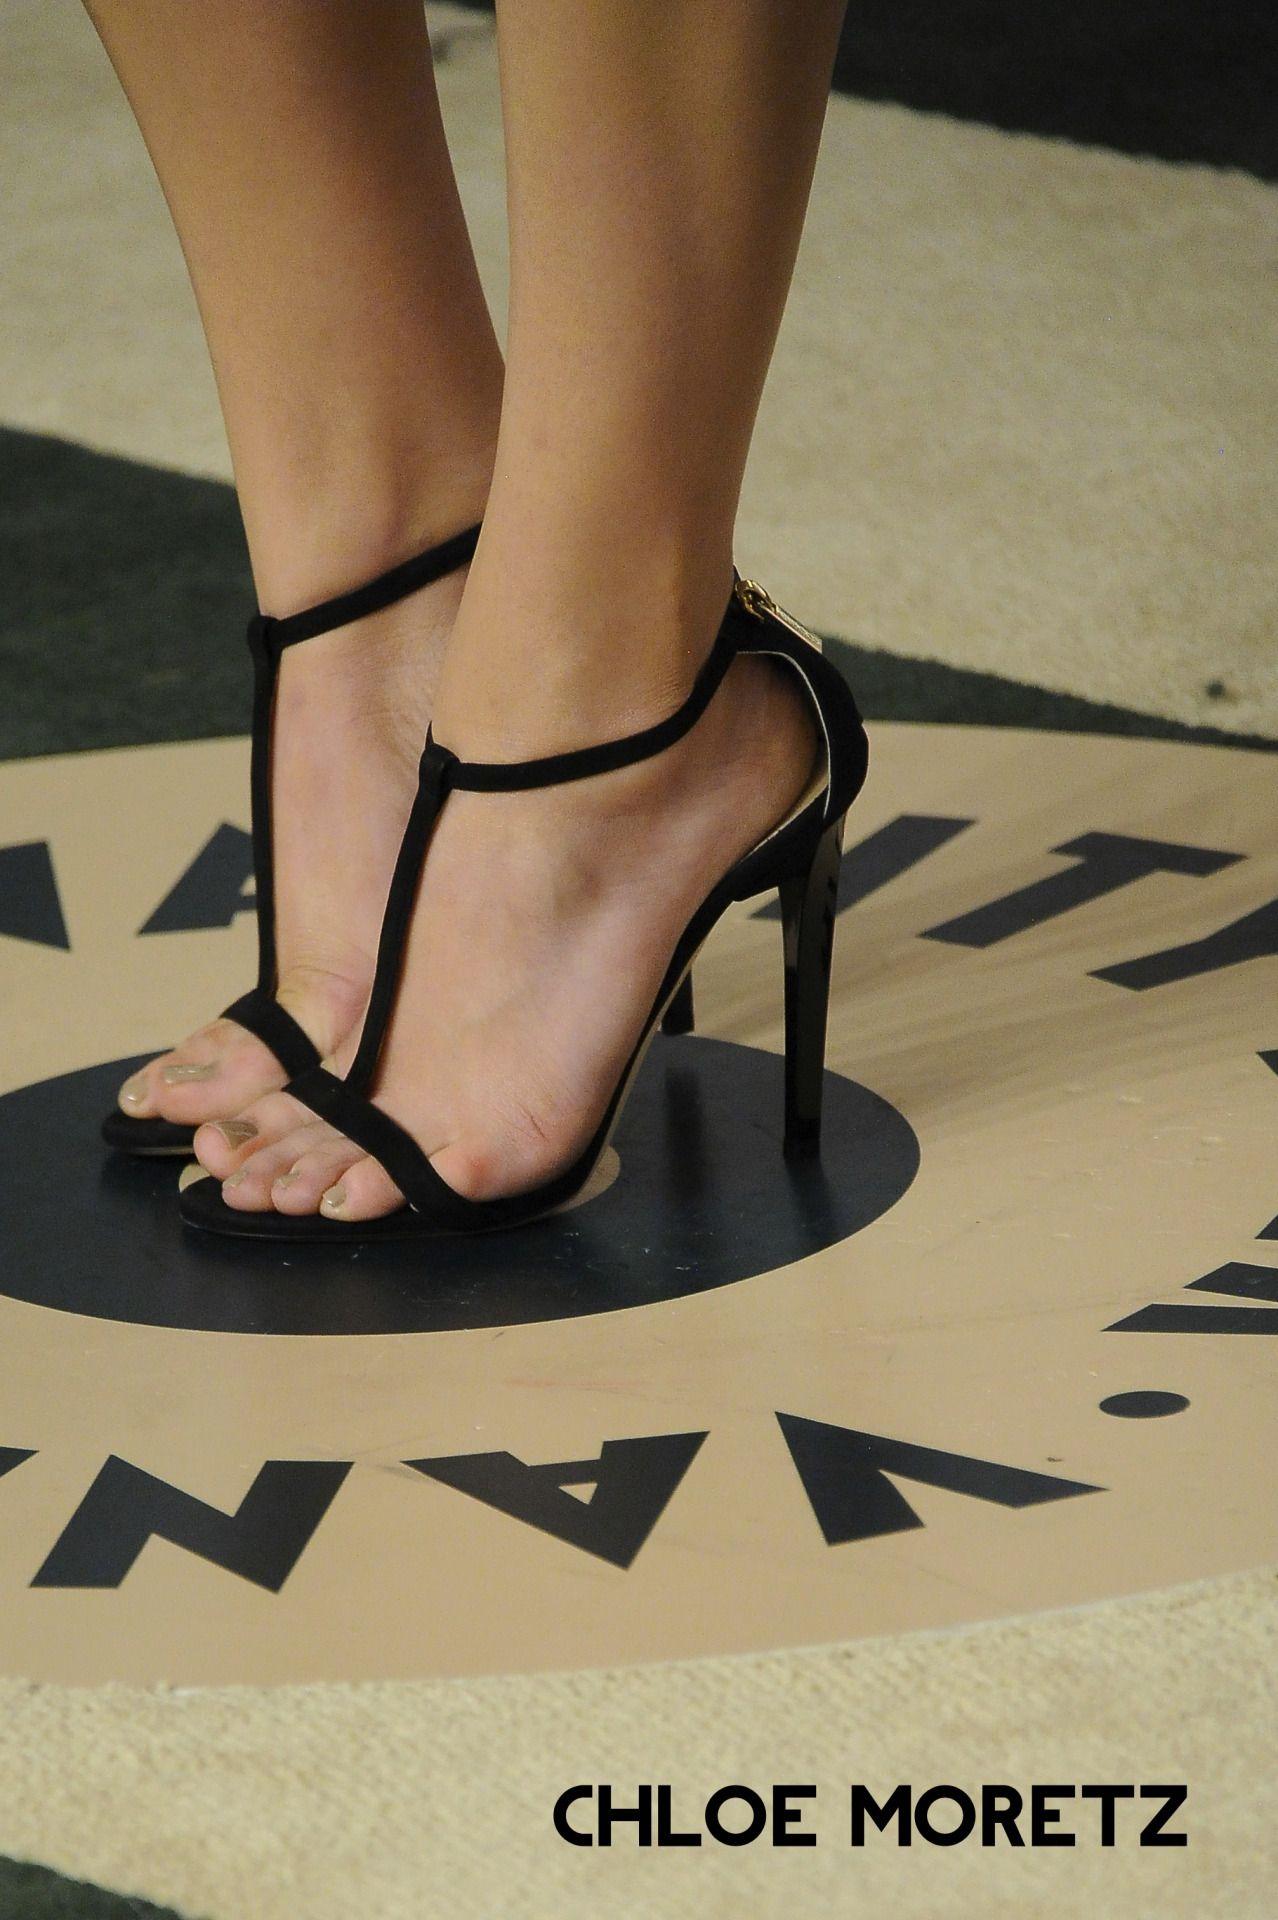 Haawheels Chloe Grace Moretz Feet Chloe Grace Moretz Chloe Grace